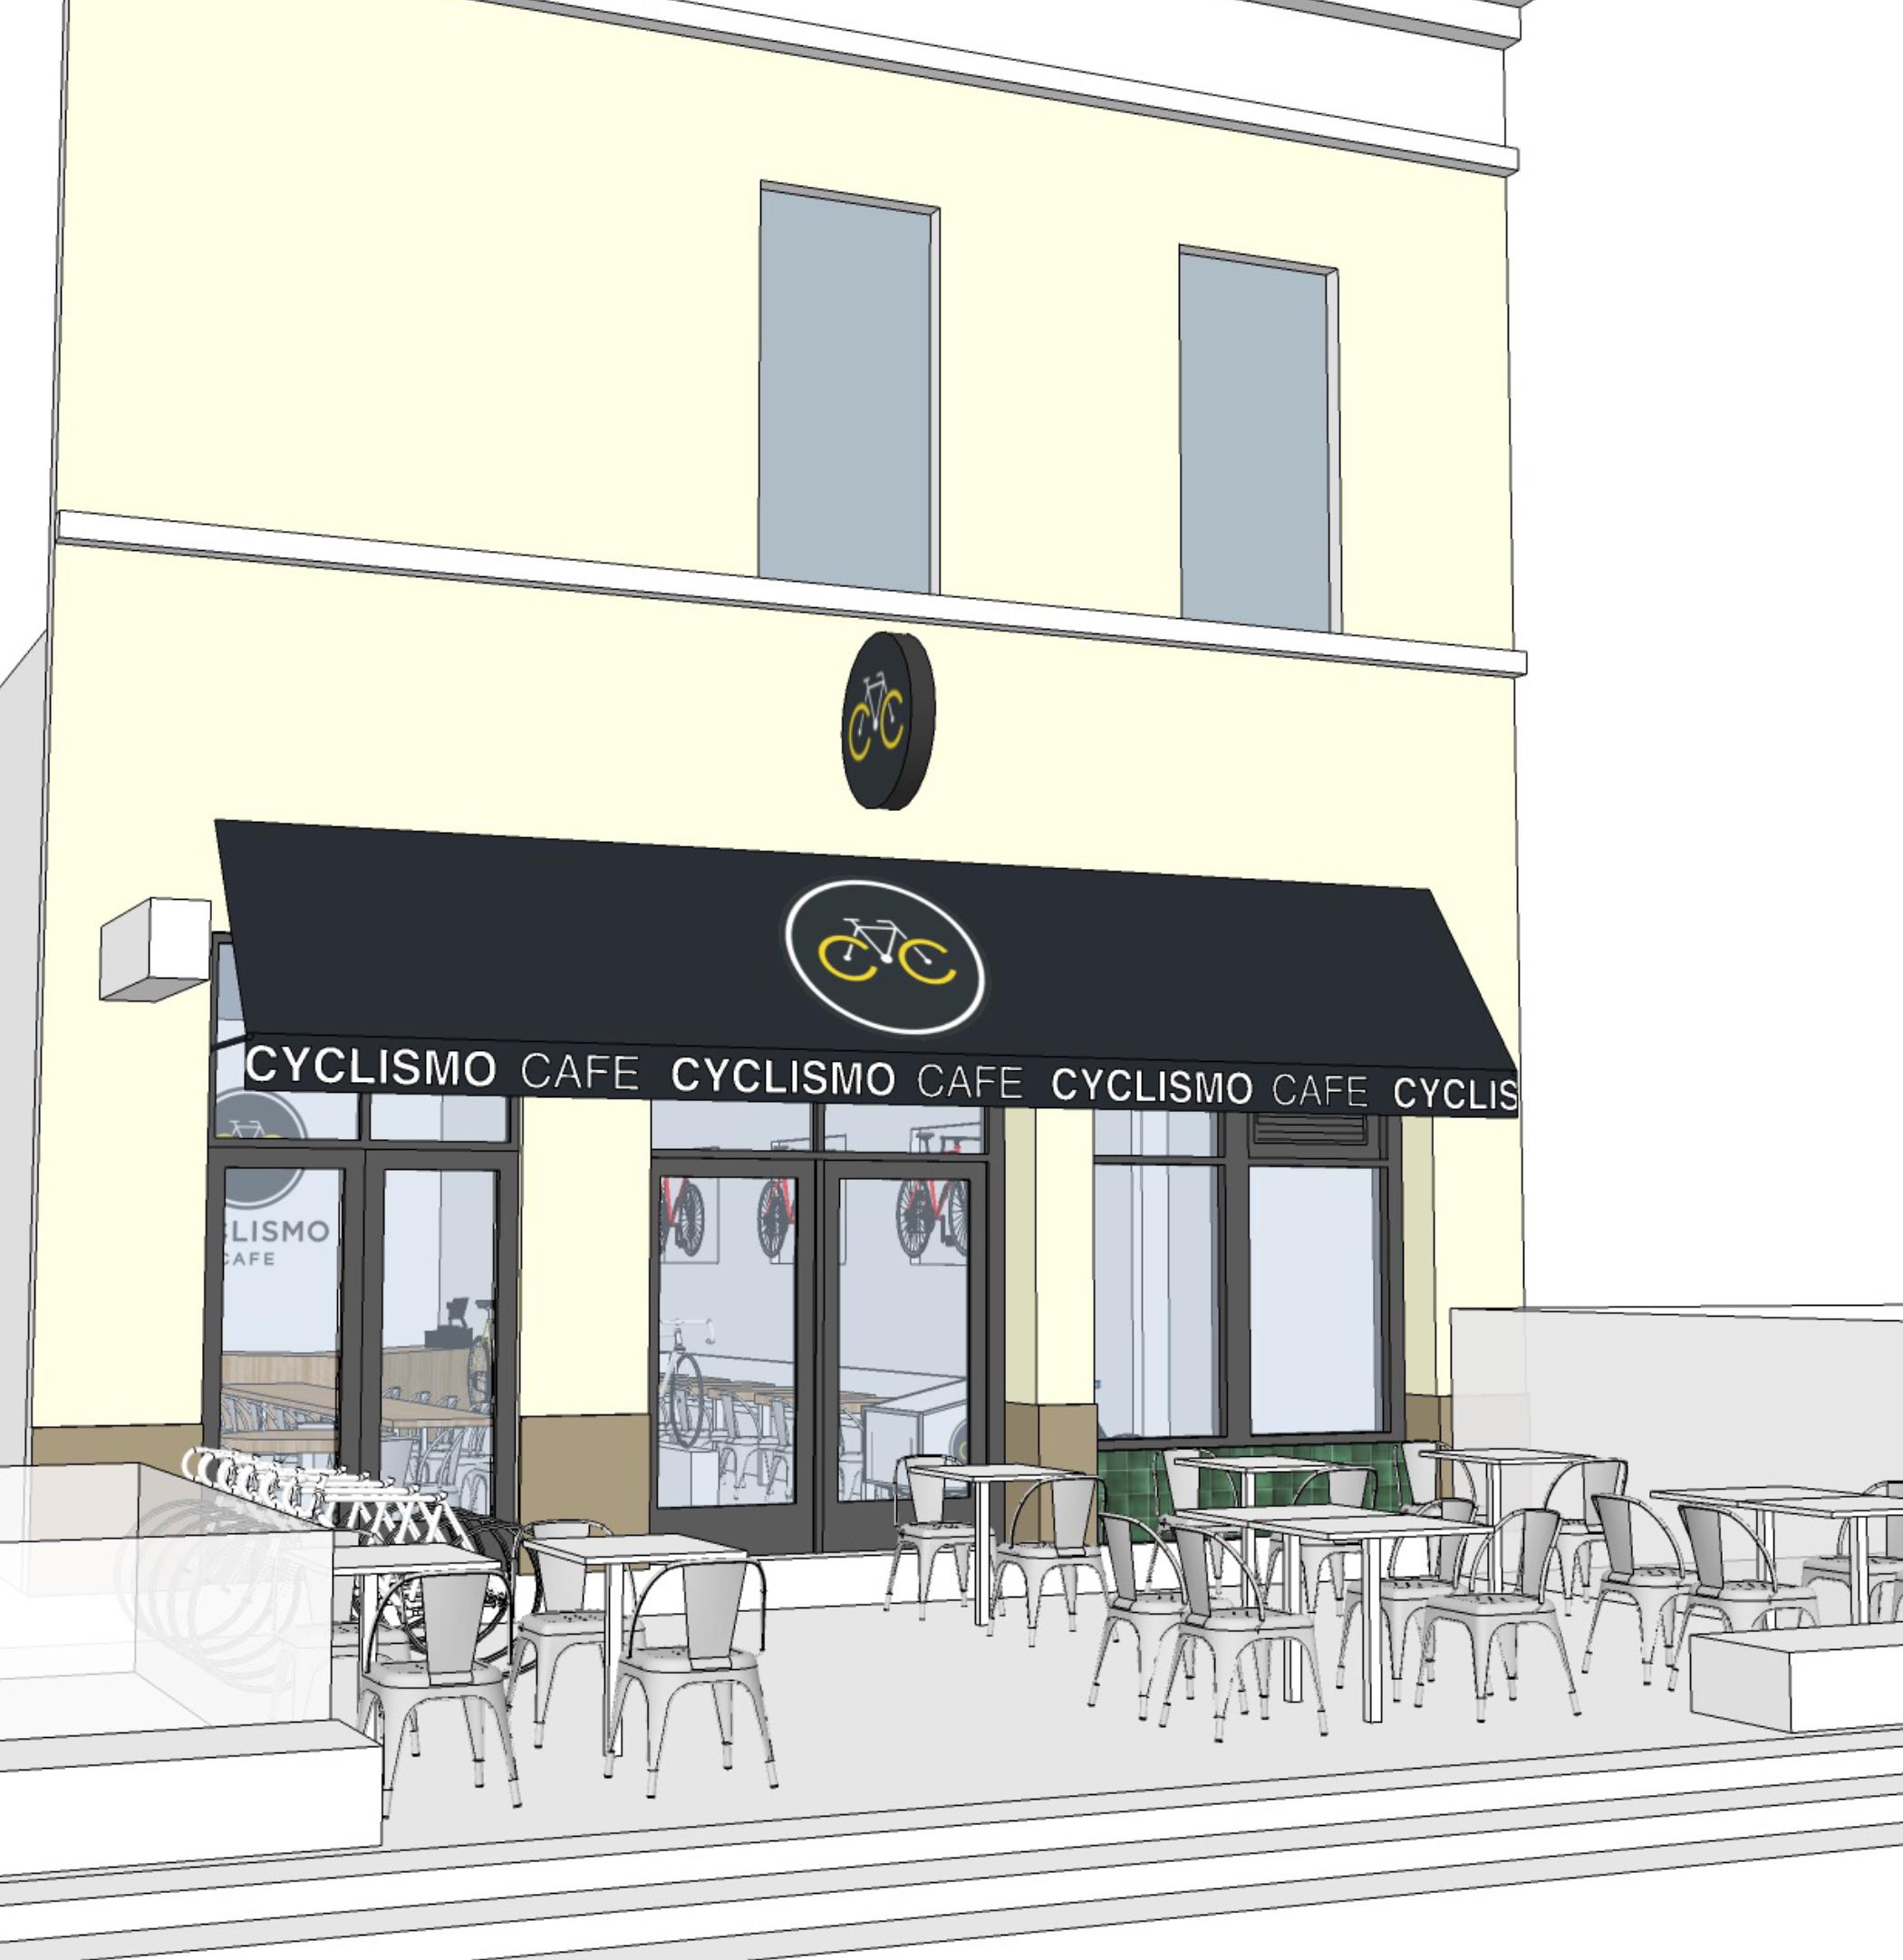 cyclismo-cafe-exterior-rendering.jpg